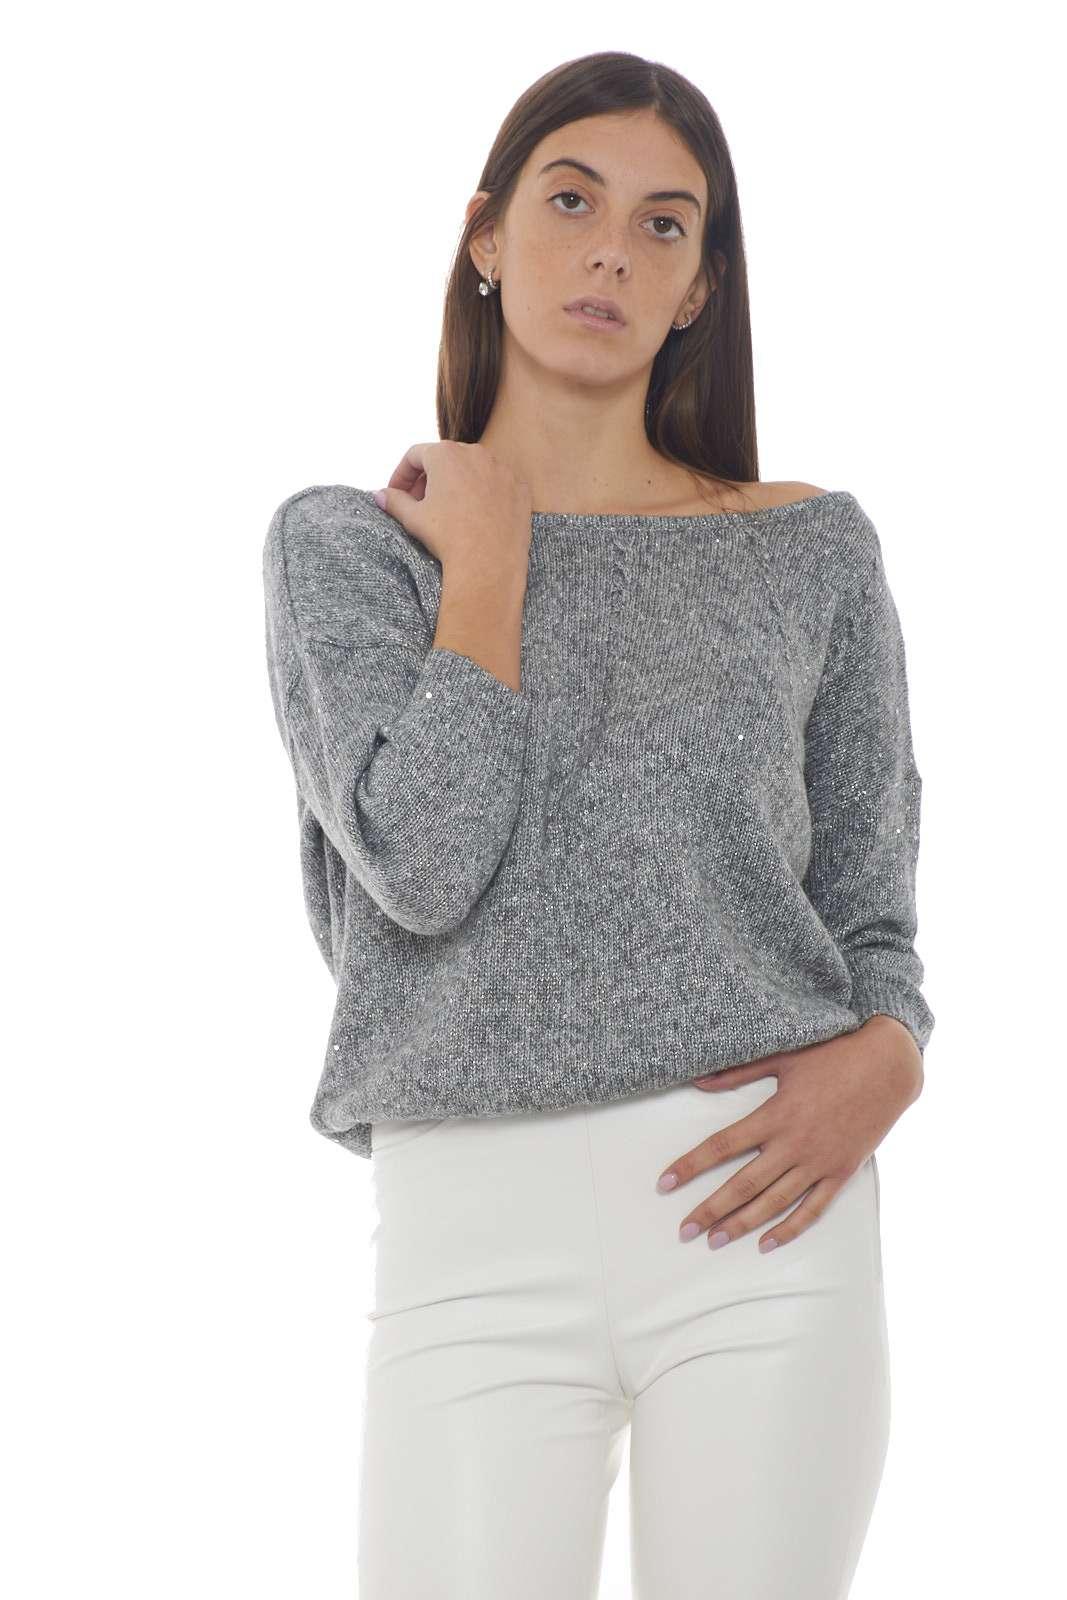 https://www.parmax.com/media/catalog/product/a/i/AI-outlet_parmax-maglia-donna-Patrizia-Pepe-8j0898-A.jpg